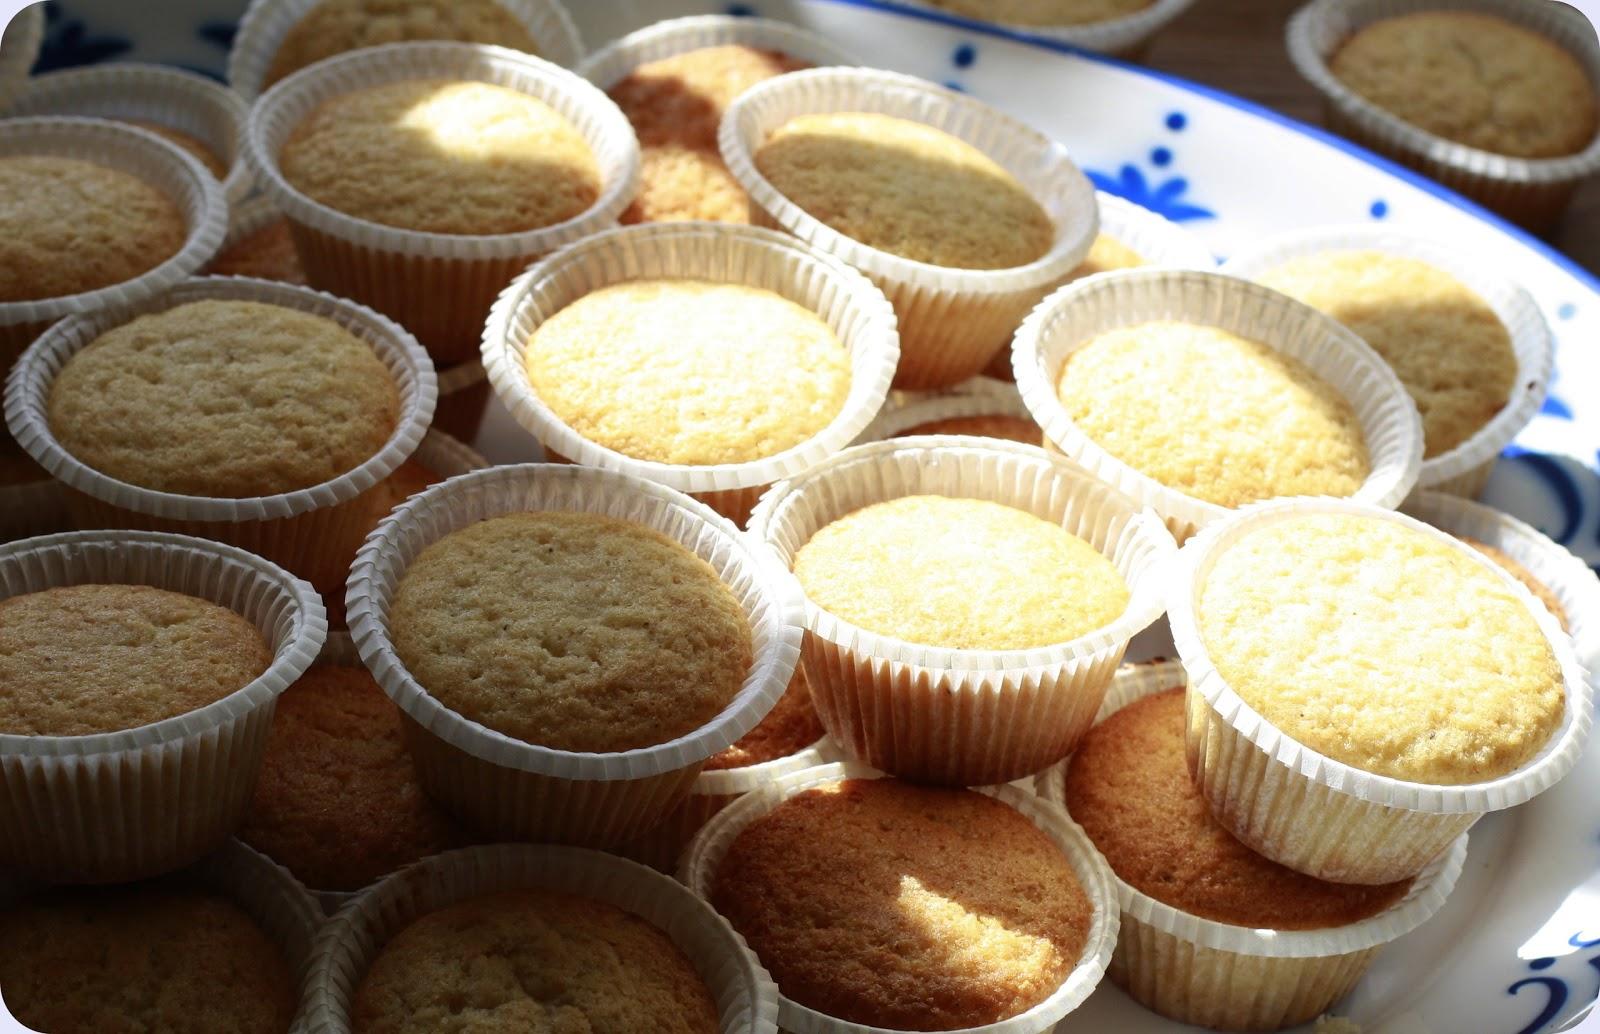 muffins uten smør